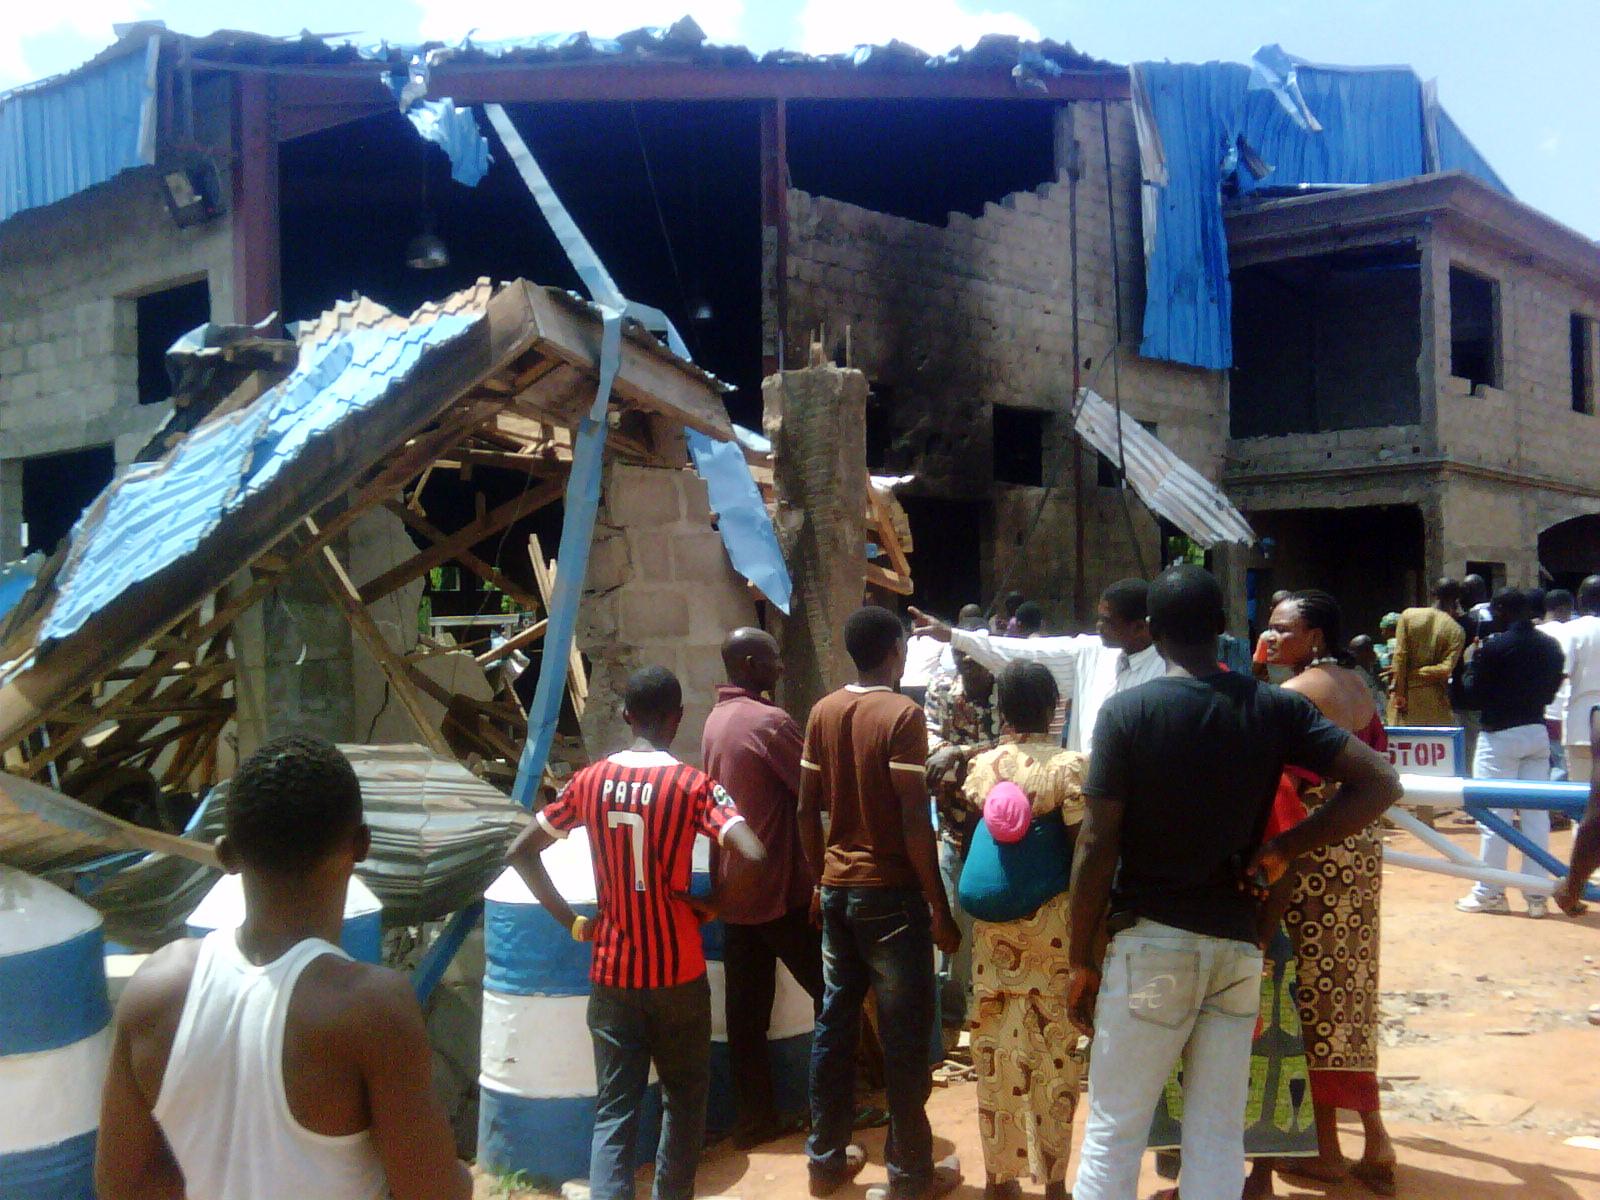 مواطنون يقفون أمام كنيسة تعرضت لهجوم في نيجيريا - 2012